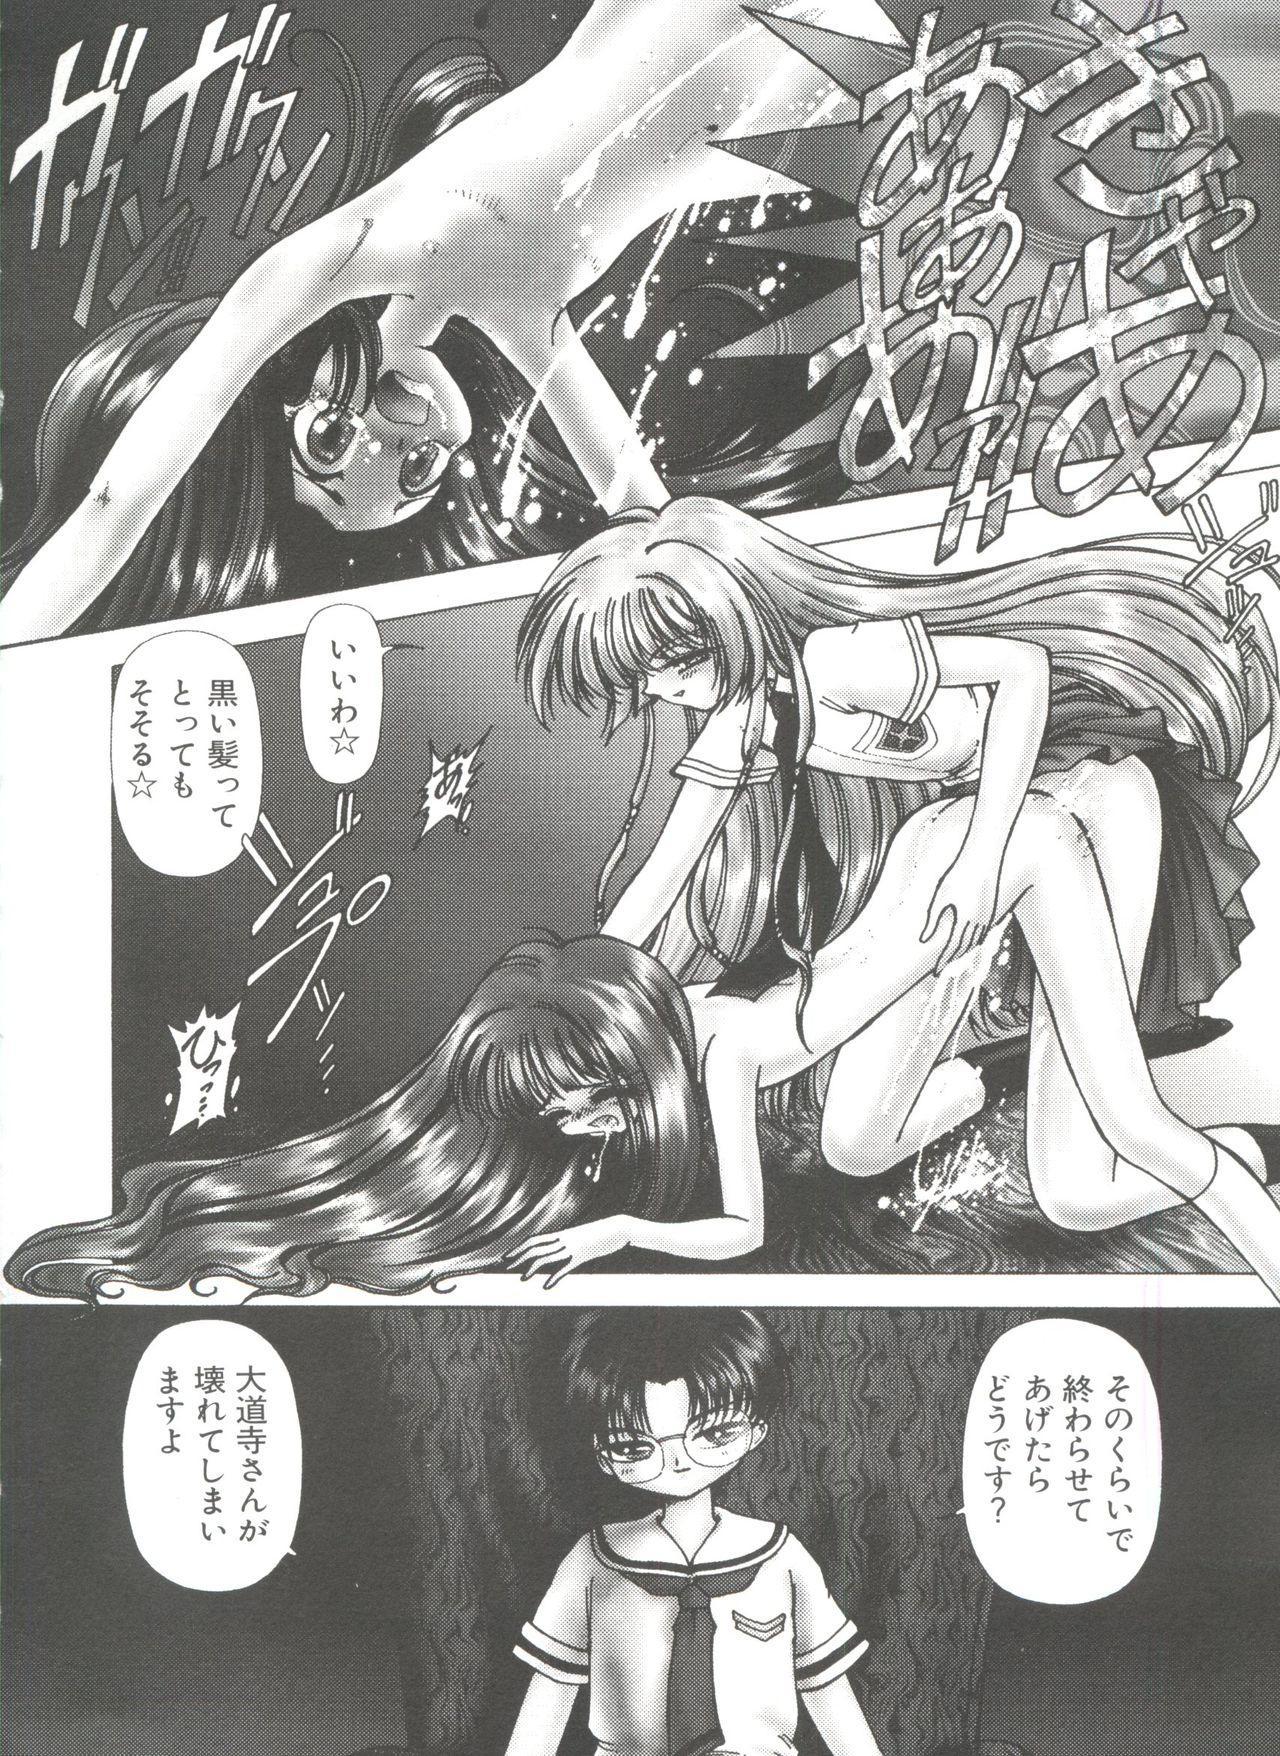 Ero-chan to Issho 3 139